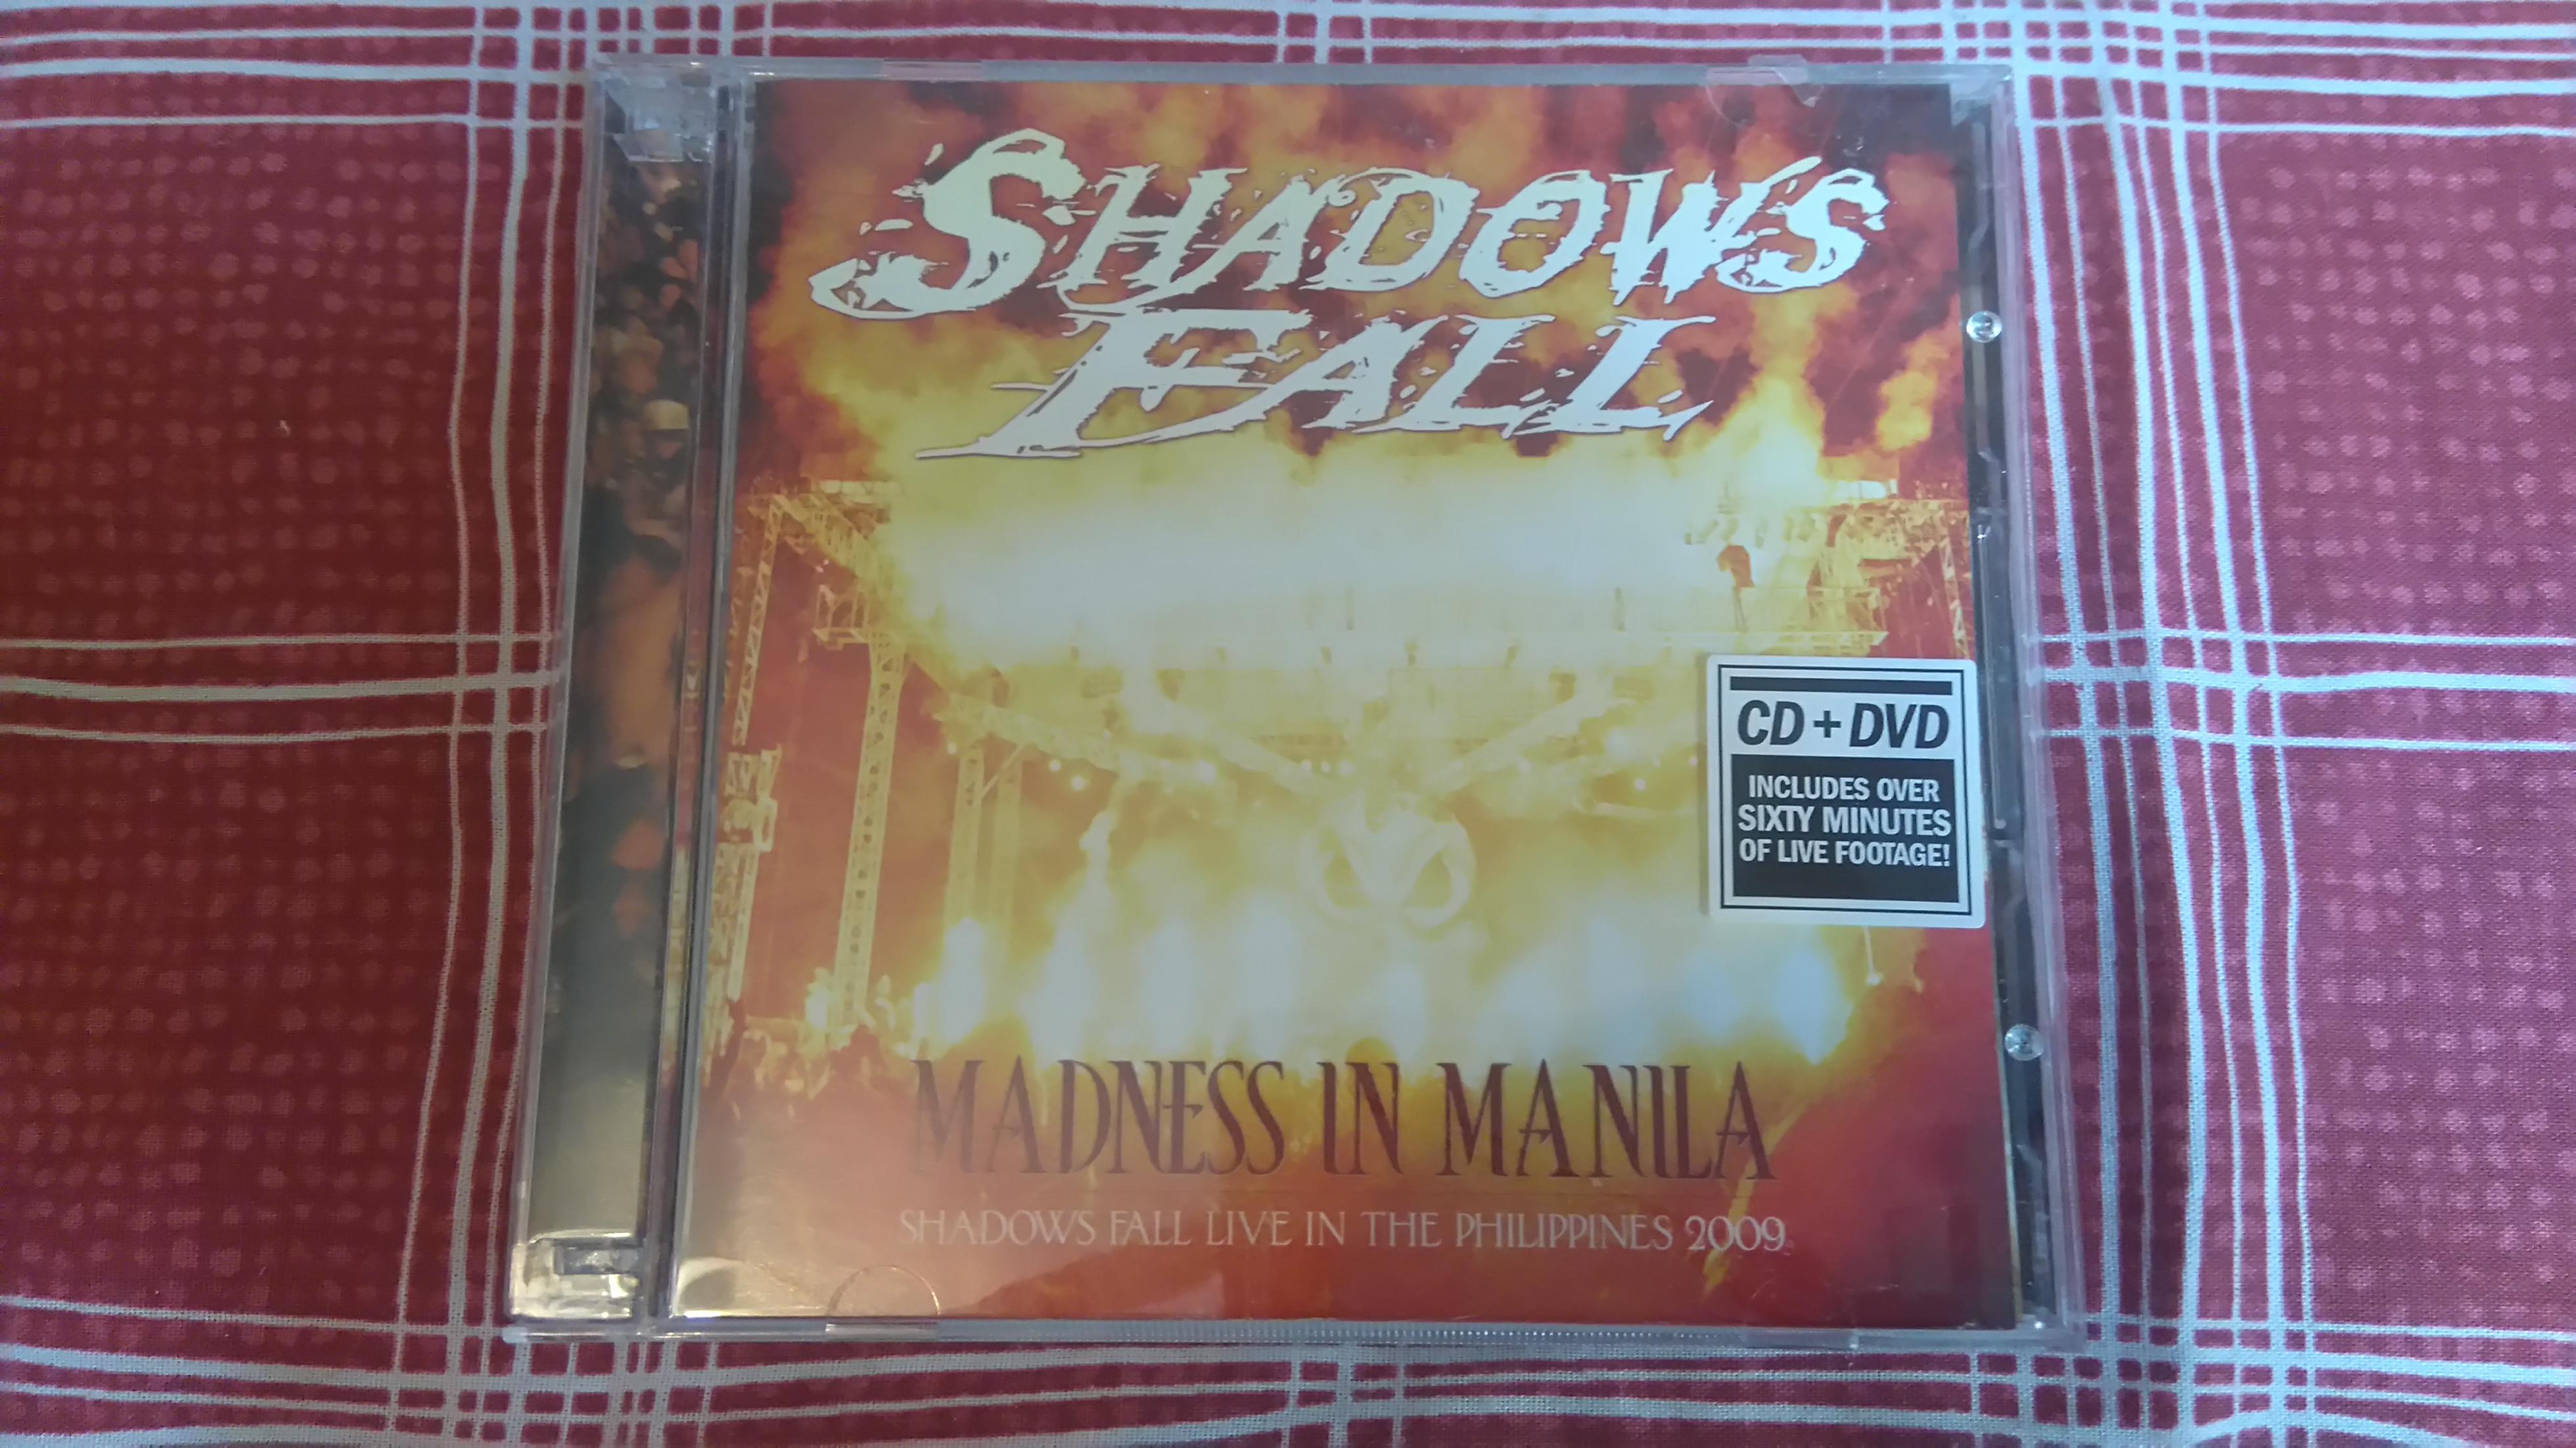 Shadows fall dvd.JPG